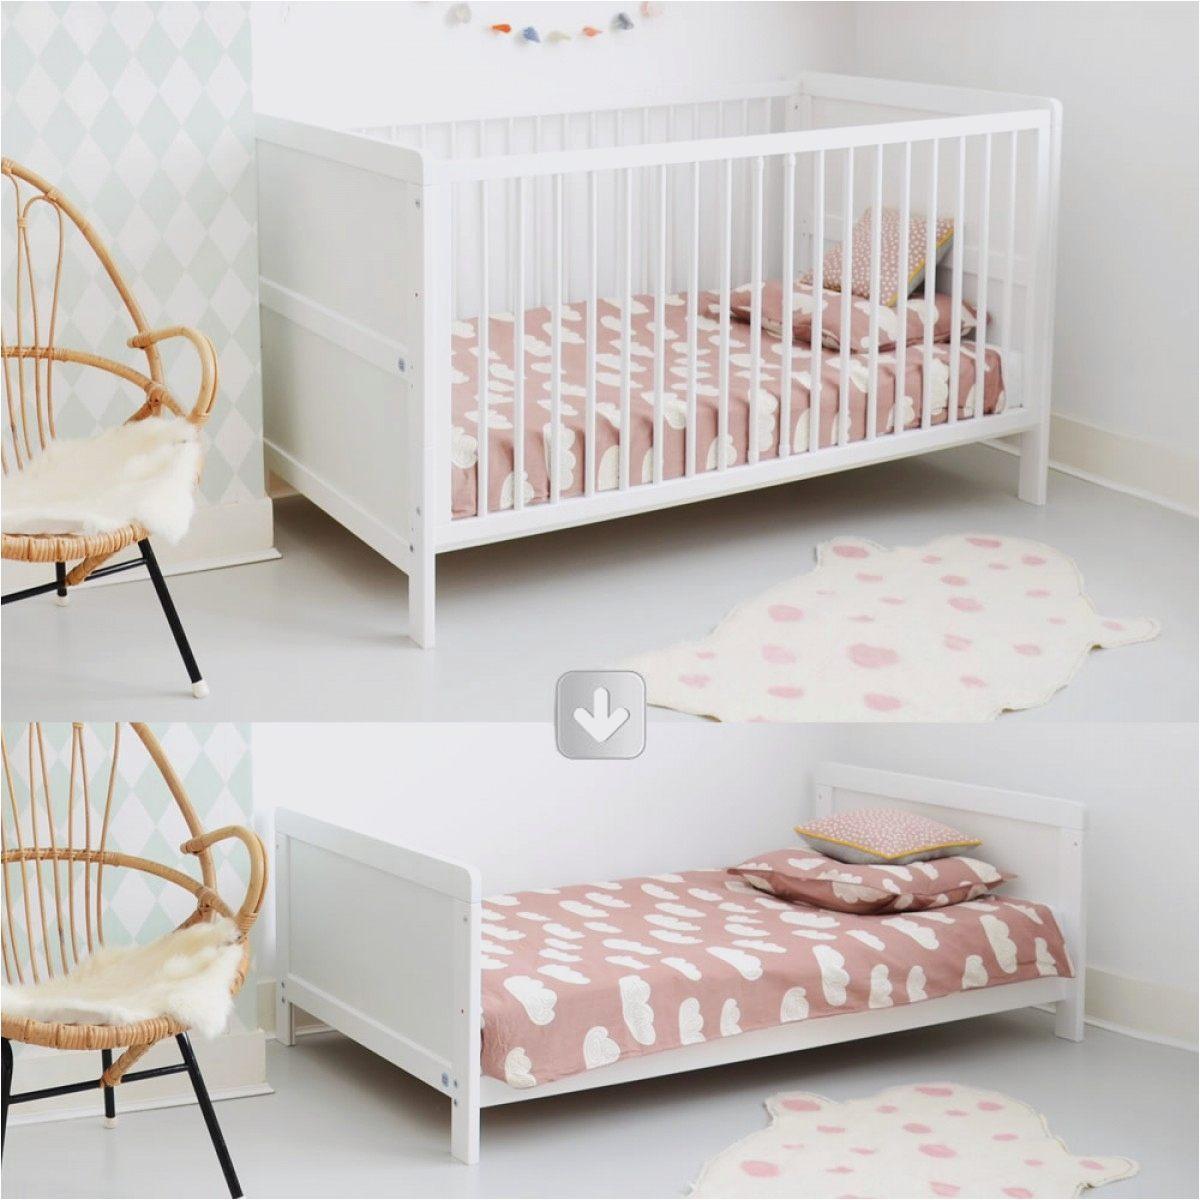 Lit Evolutif Pour Enfant Beau Chambre Evolutive Luxe Matelas Oeko Tex Inspirational Pinolino 0d